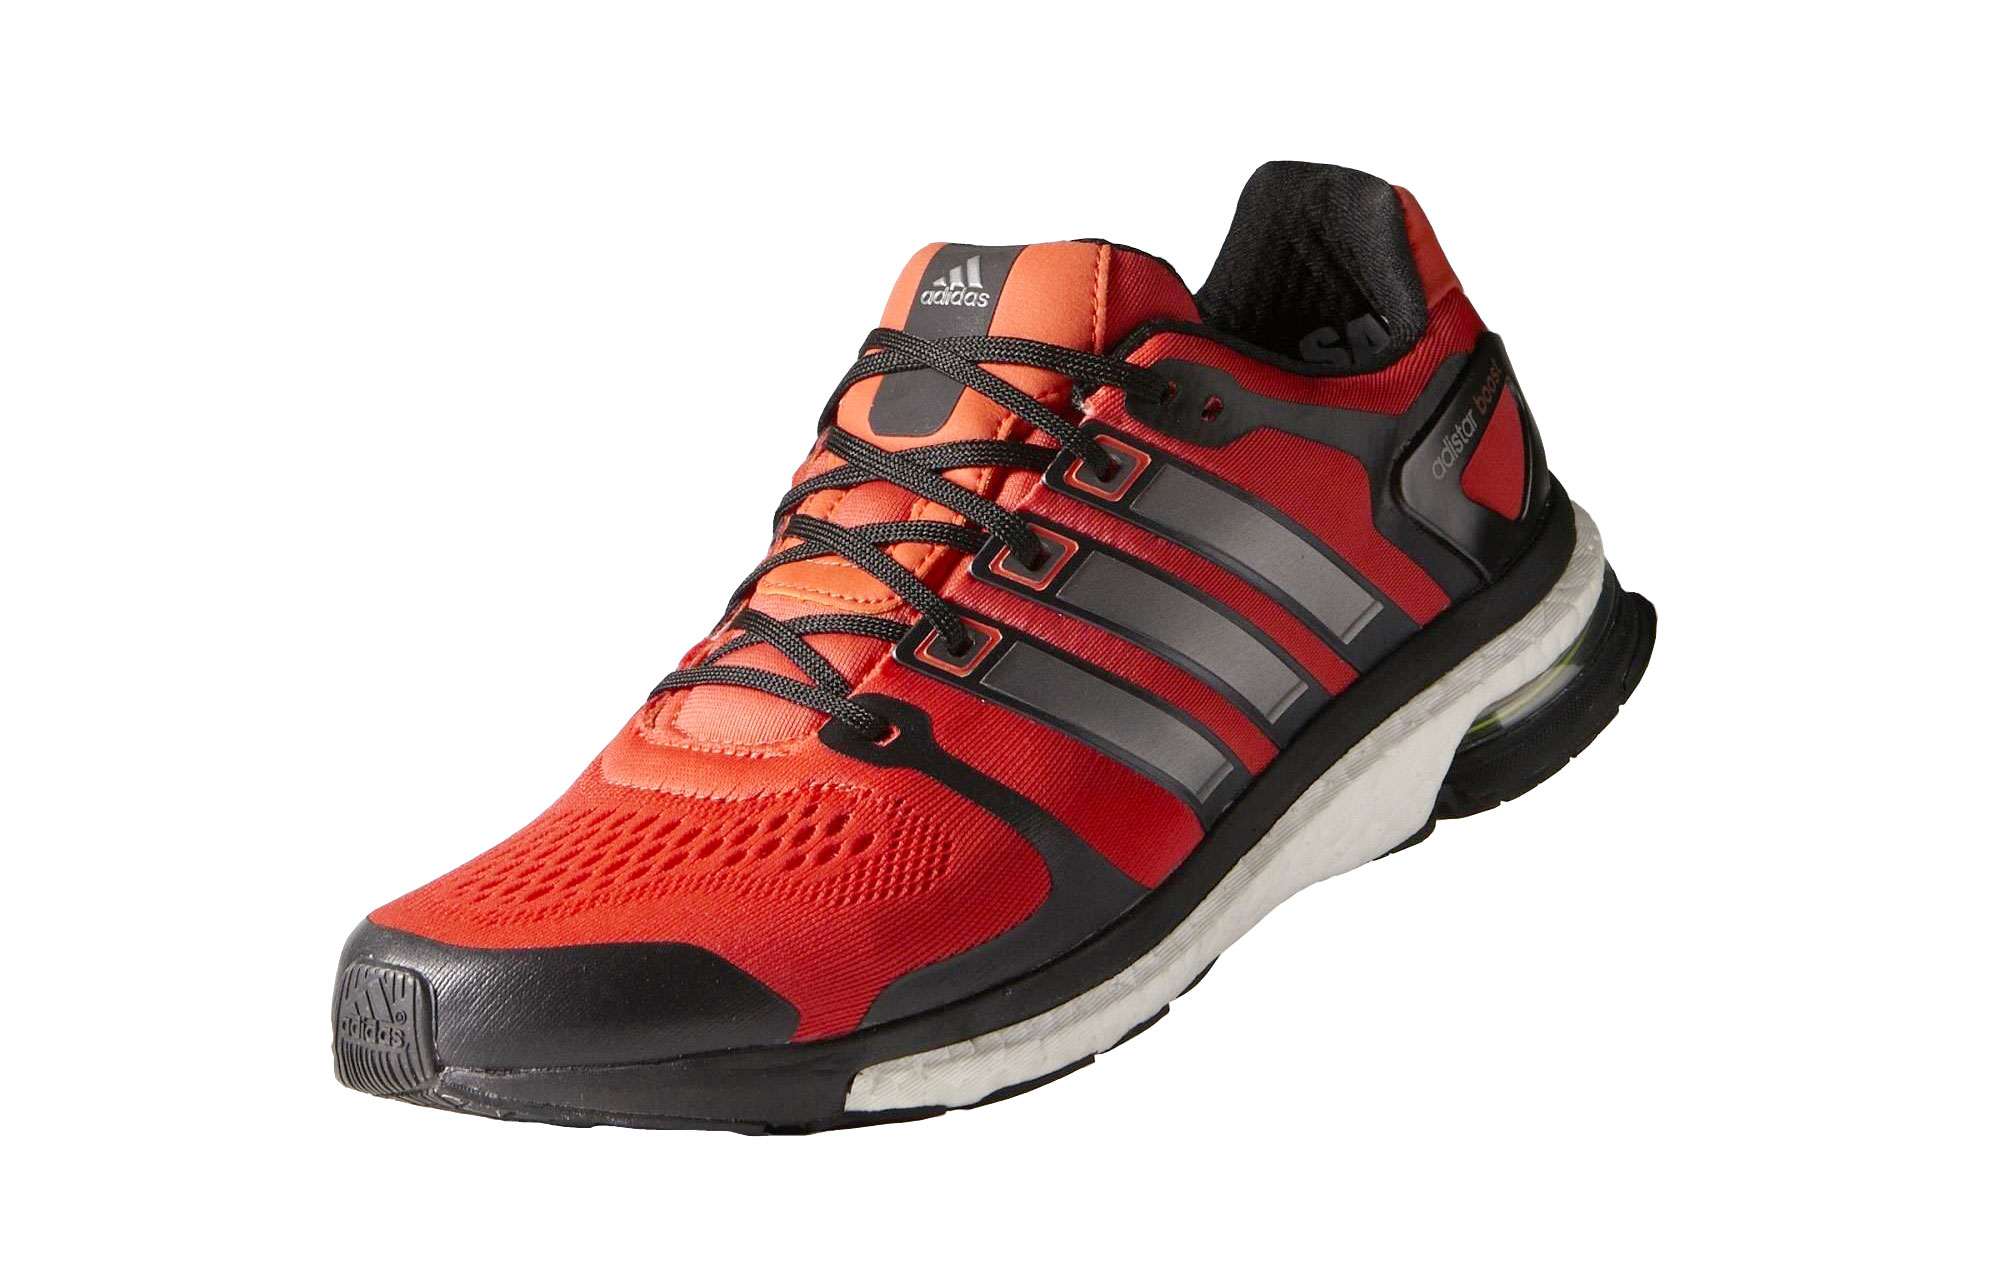 the best attitude 2a904 423f3 Zapatillas Adidas Adistar Boost ESM Hombre Negro Rojo